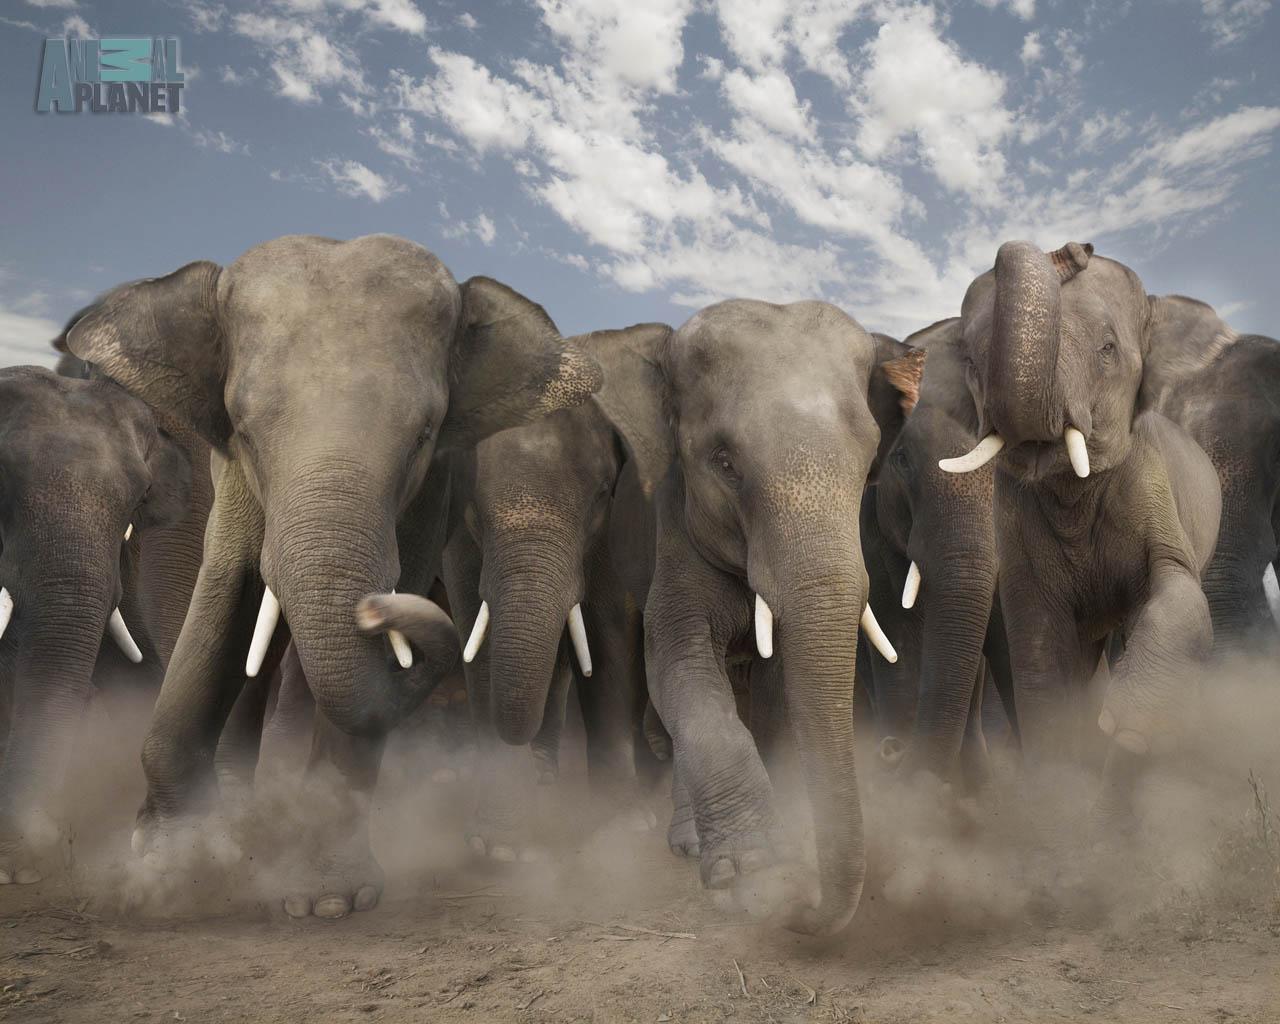 wild animals animal elephant stampede elephants charging herd wildlife nature wallpapers backgrounds desktop herds any stampeding elefantes pic africa comments